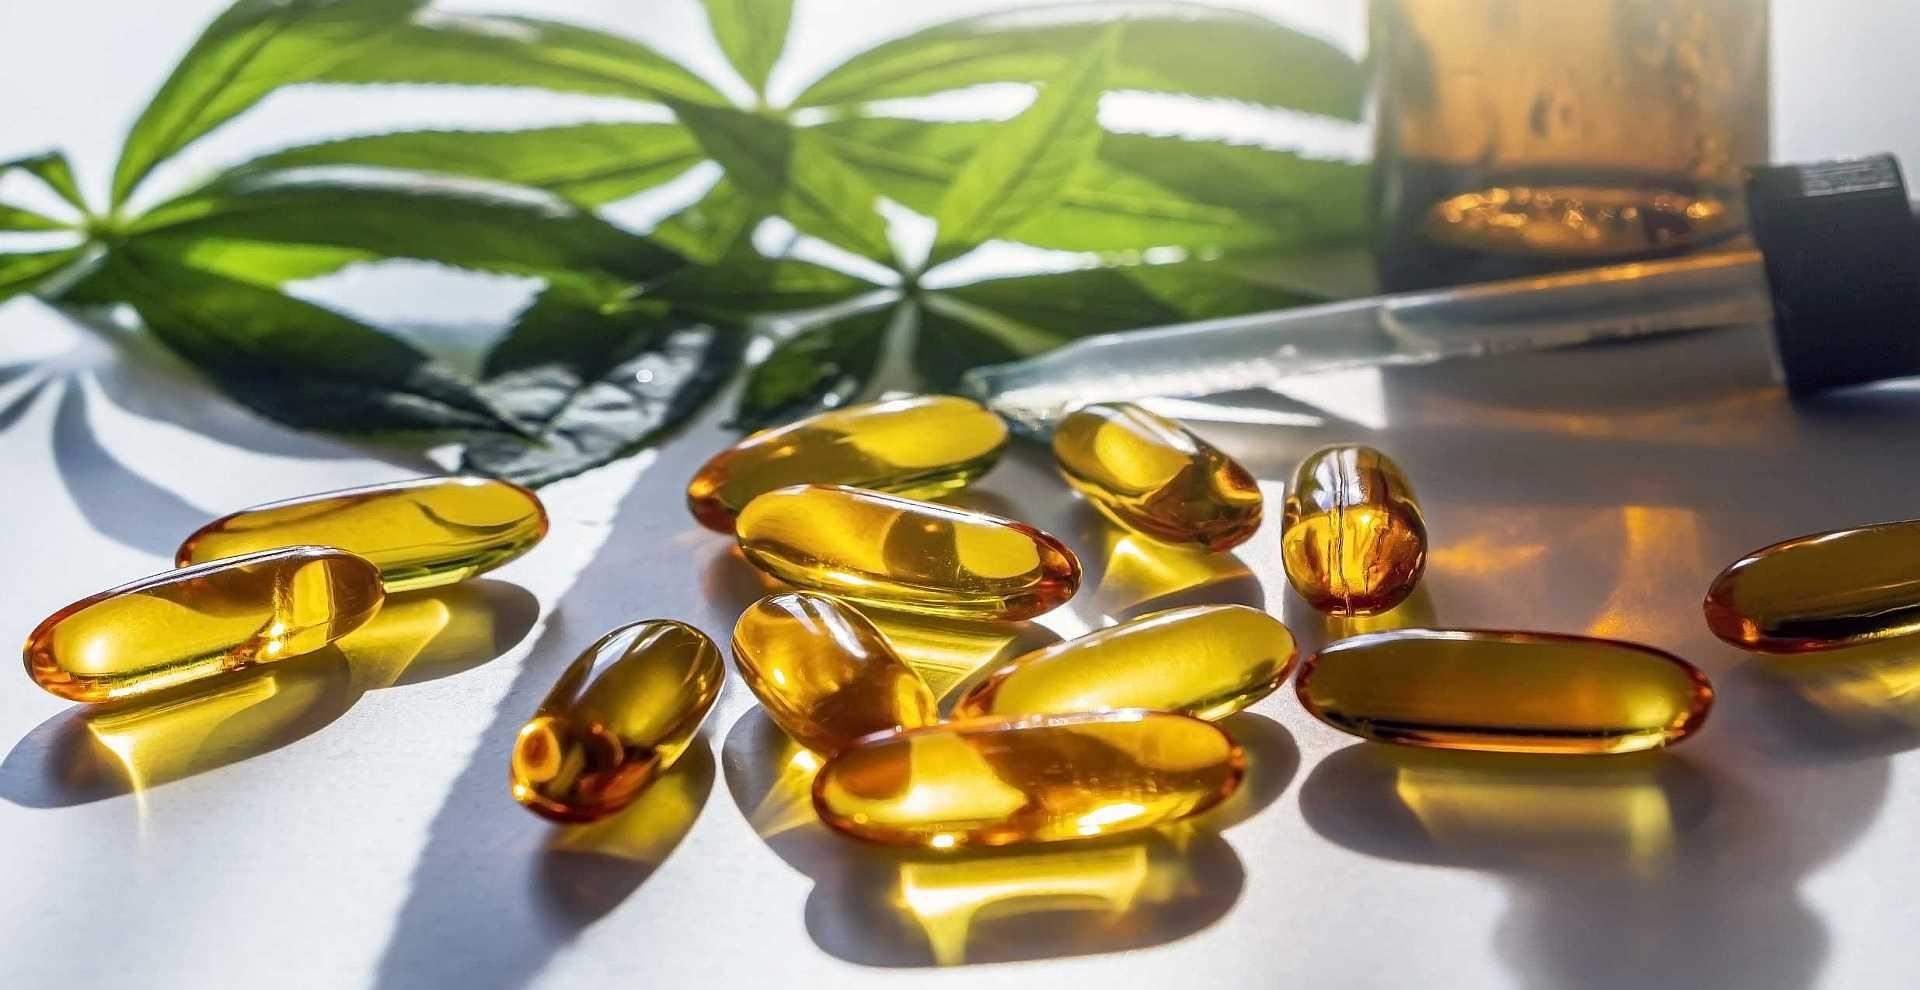 Сочетание Омега-3 и CBD эффективно при воспаленном кишечнике